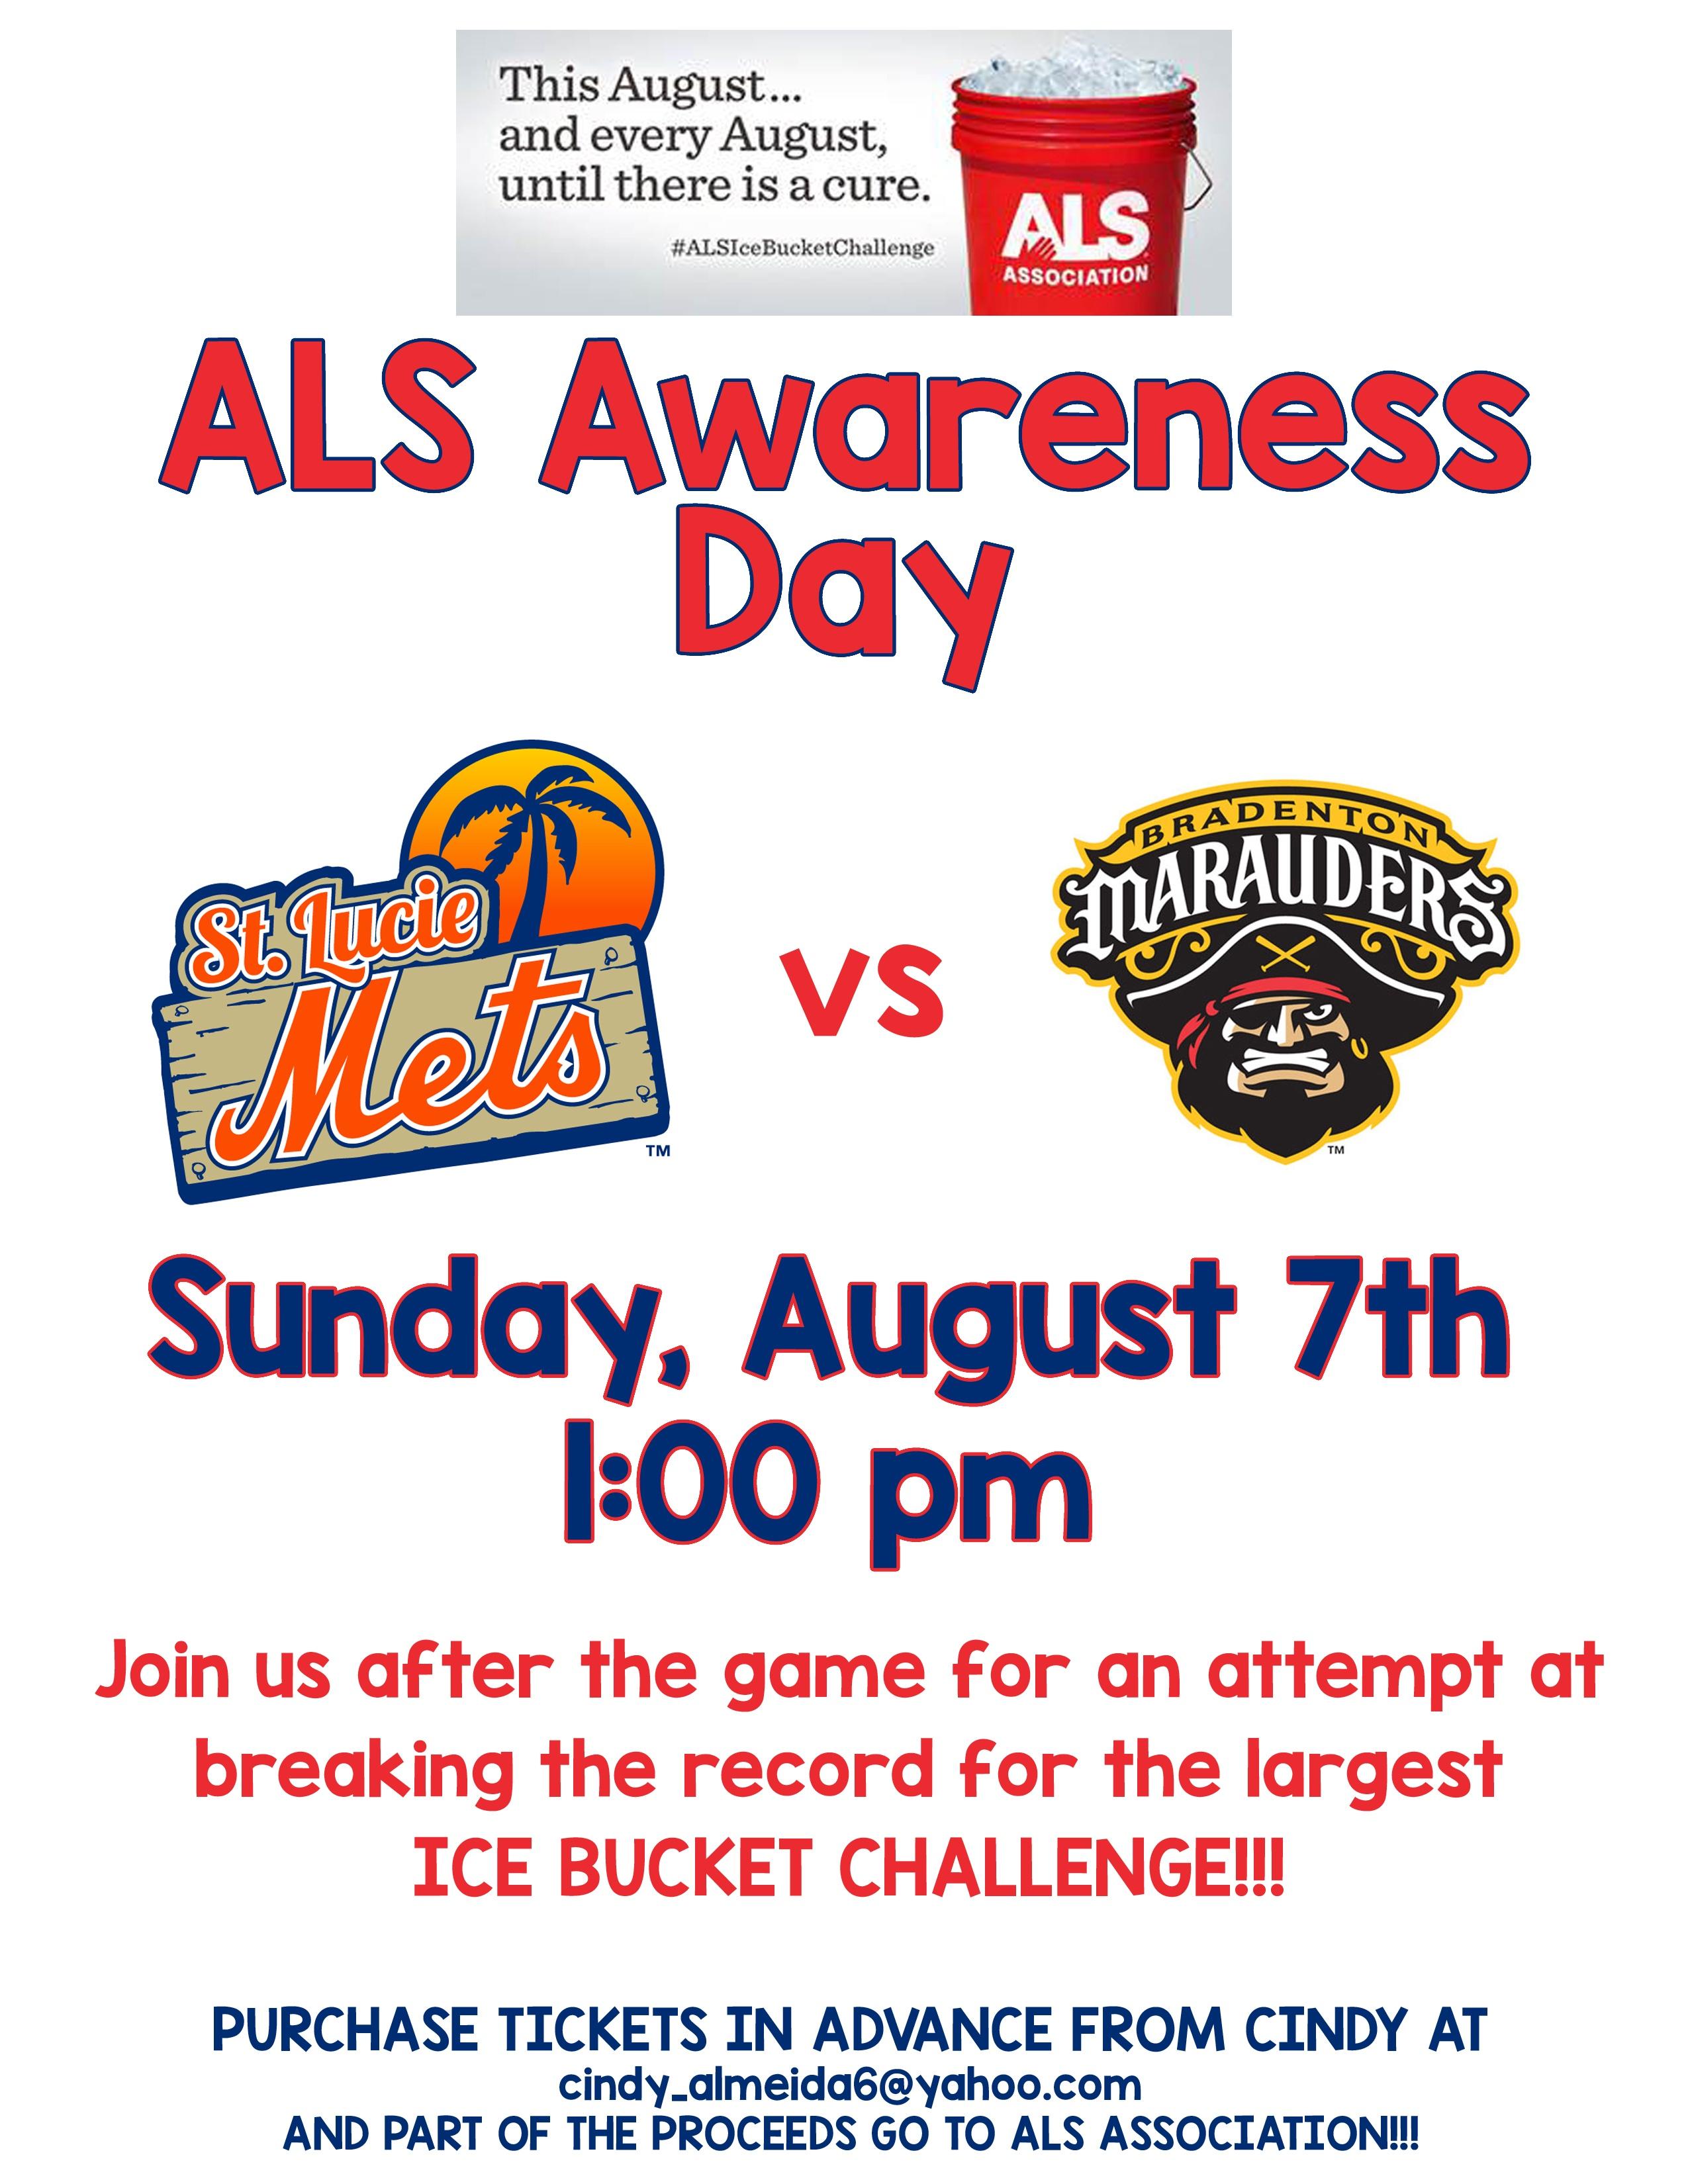 ALS_Awareness_Day.jpg